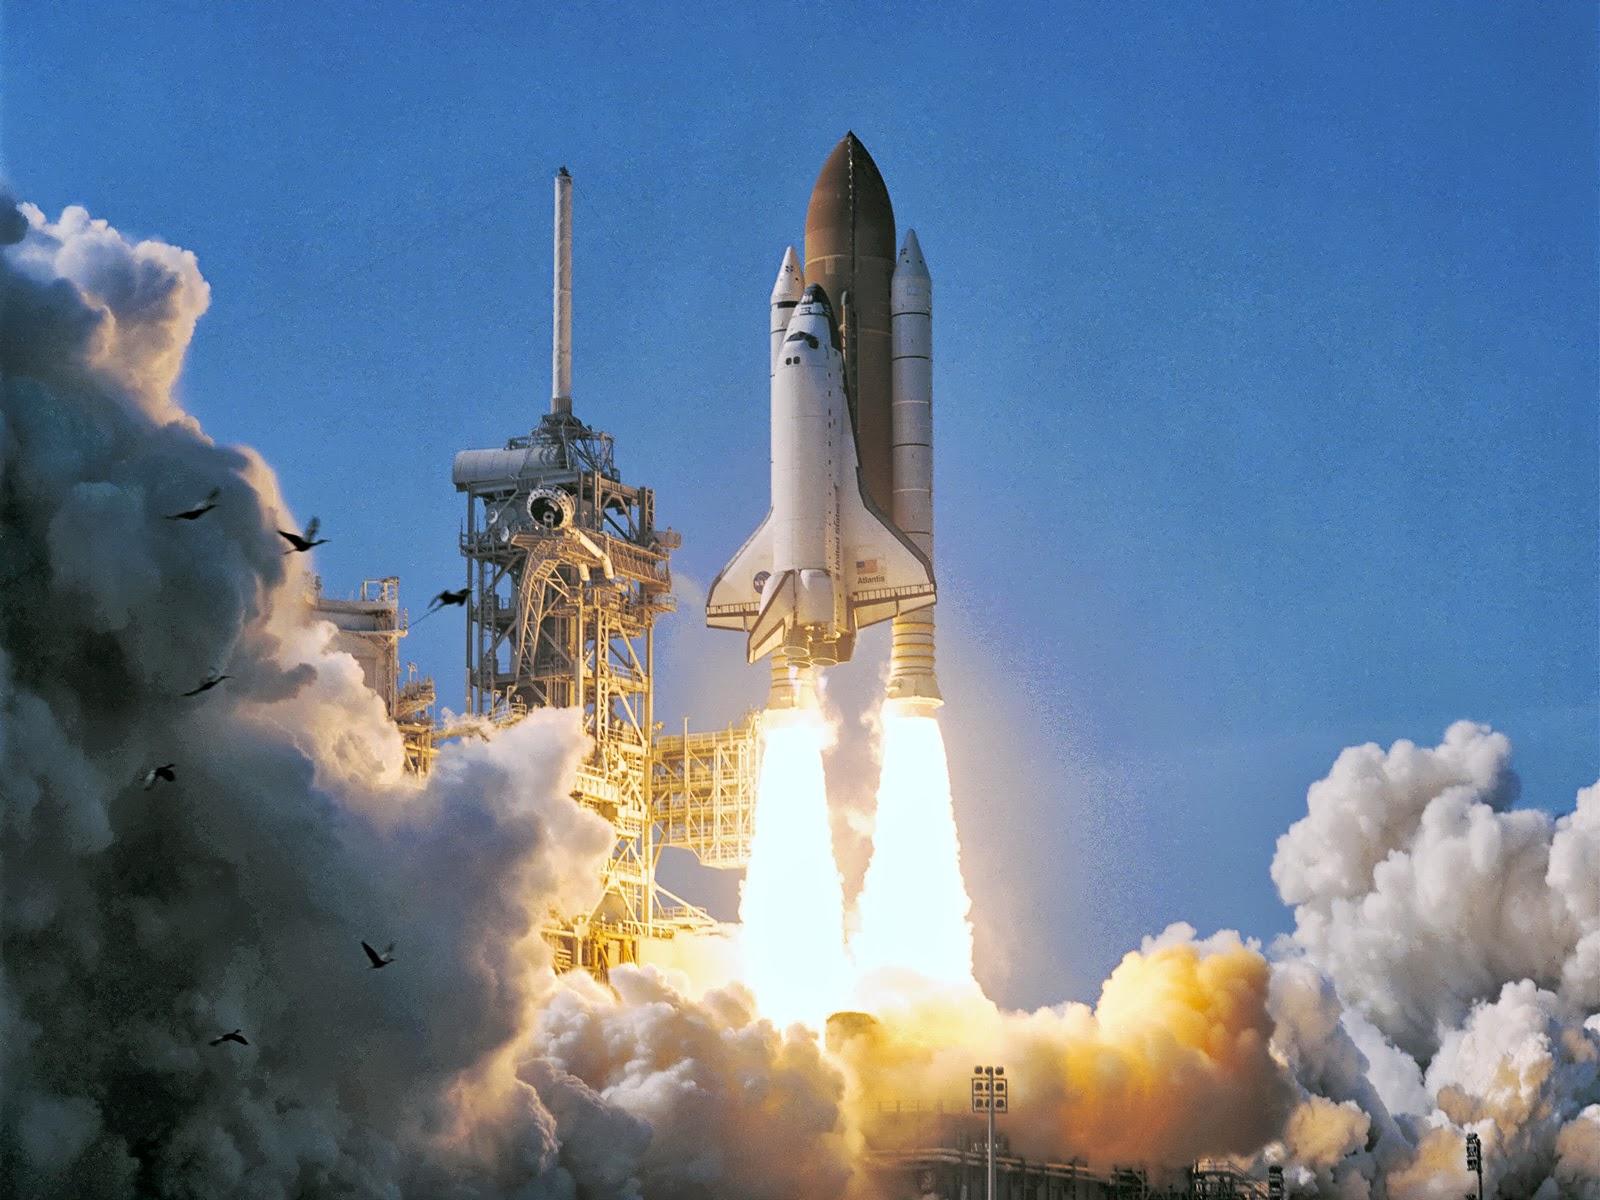 Space Shuttle Wallpaper Widescreen - WallpaperSafari